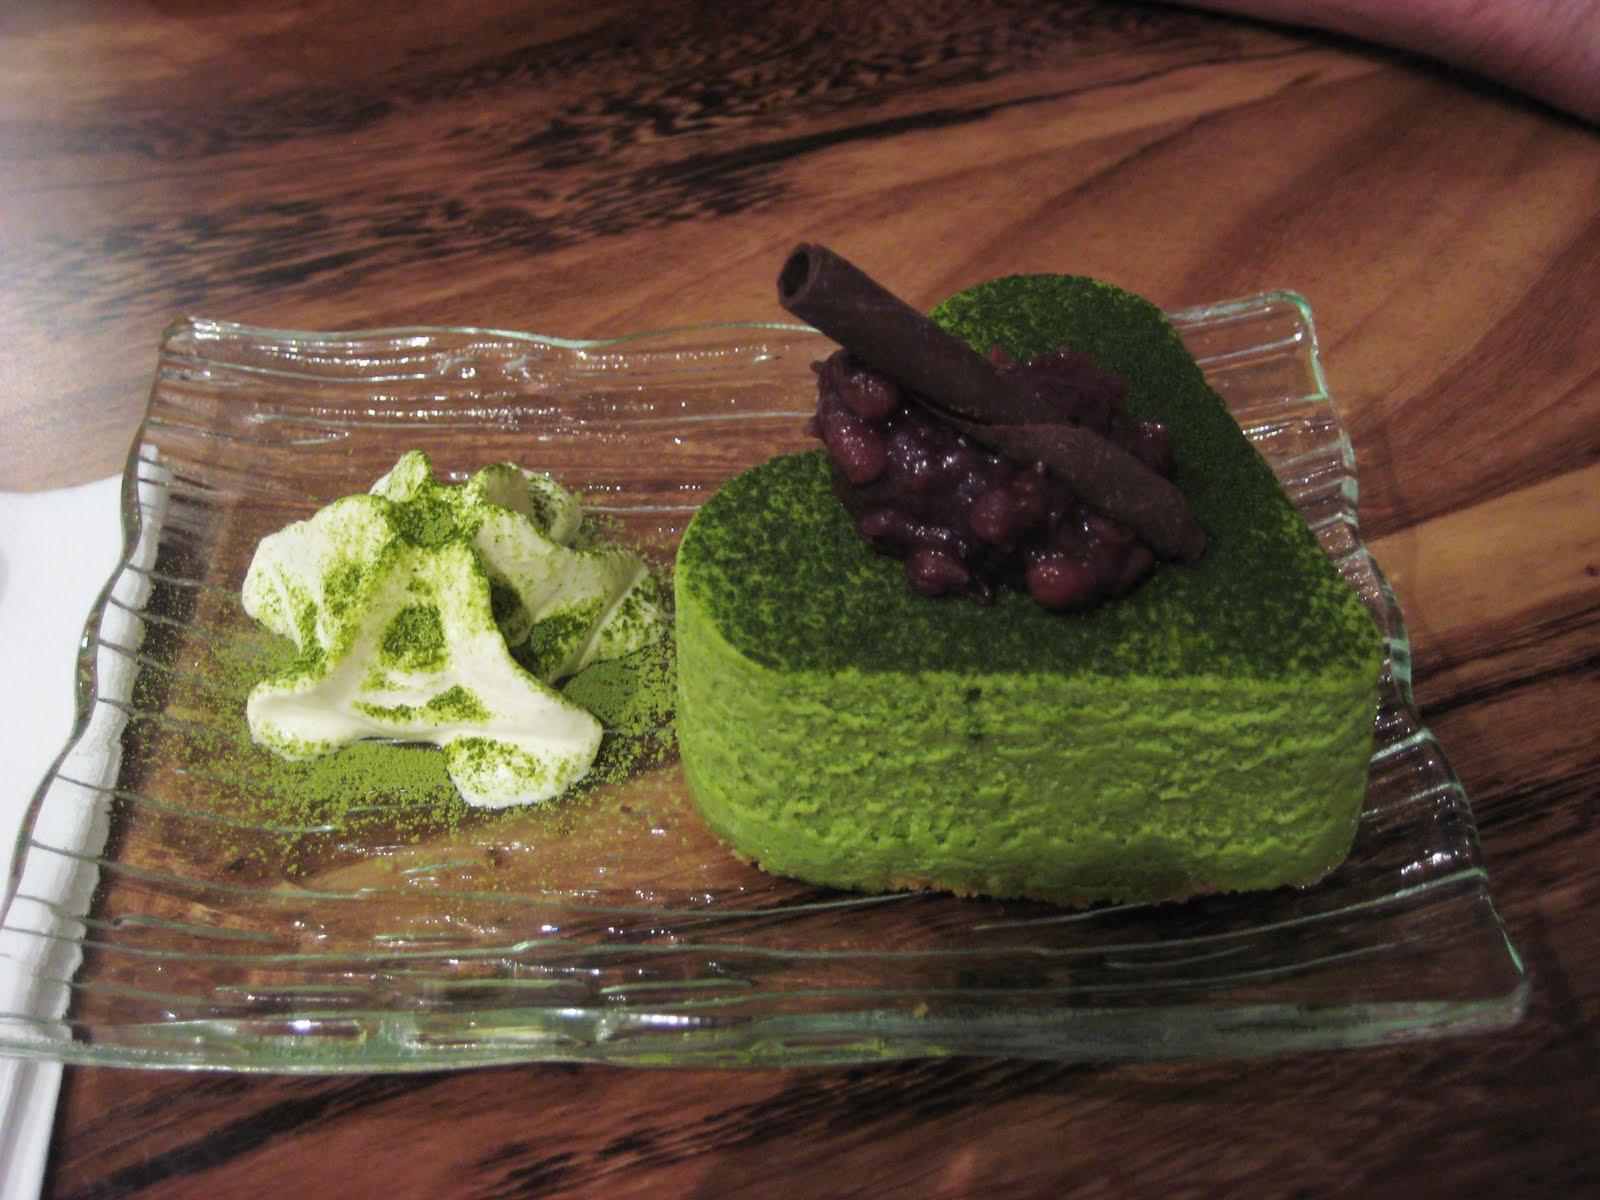 A Bit Of Space Wasabi Dessert Room